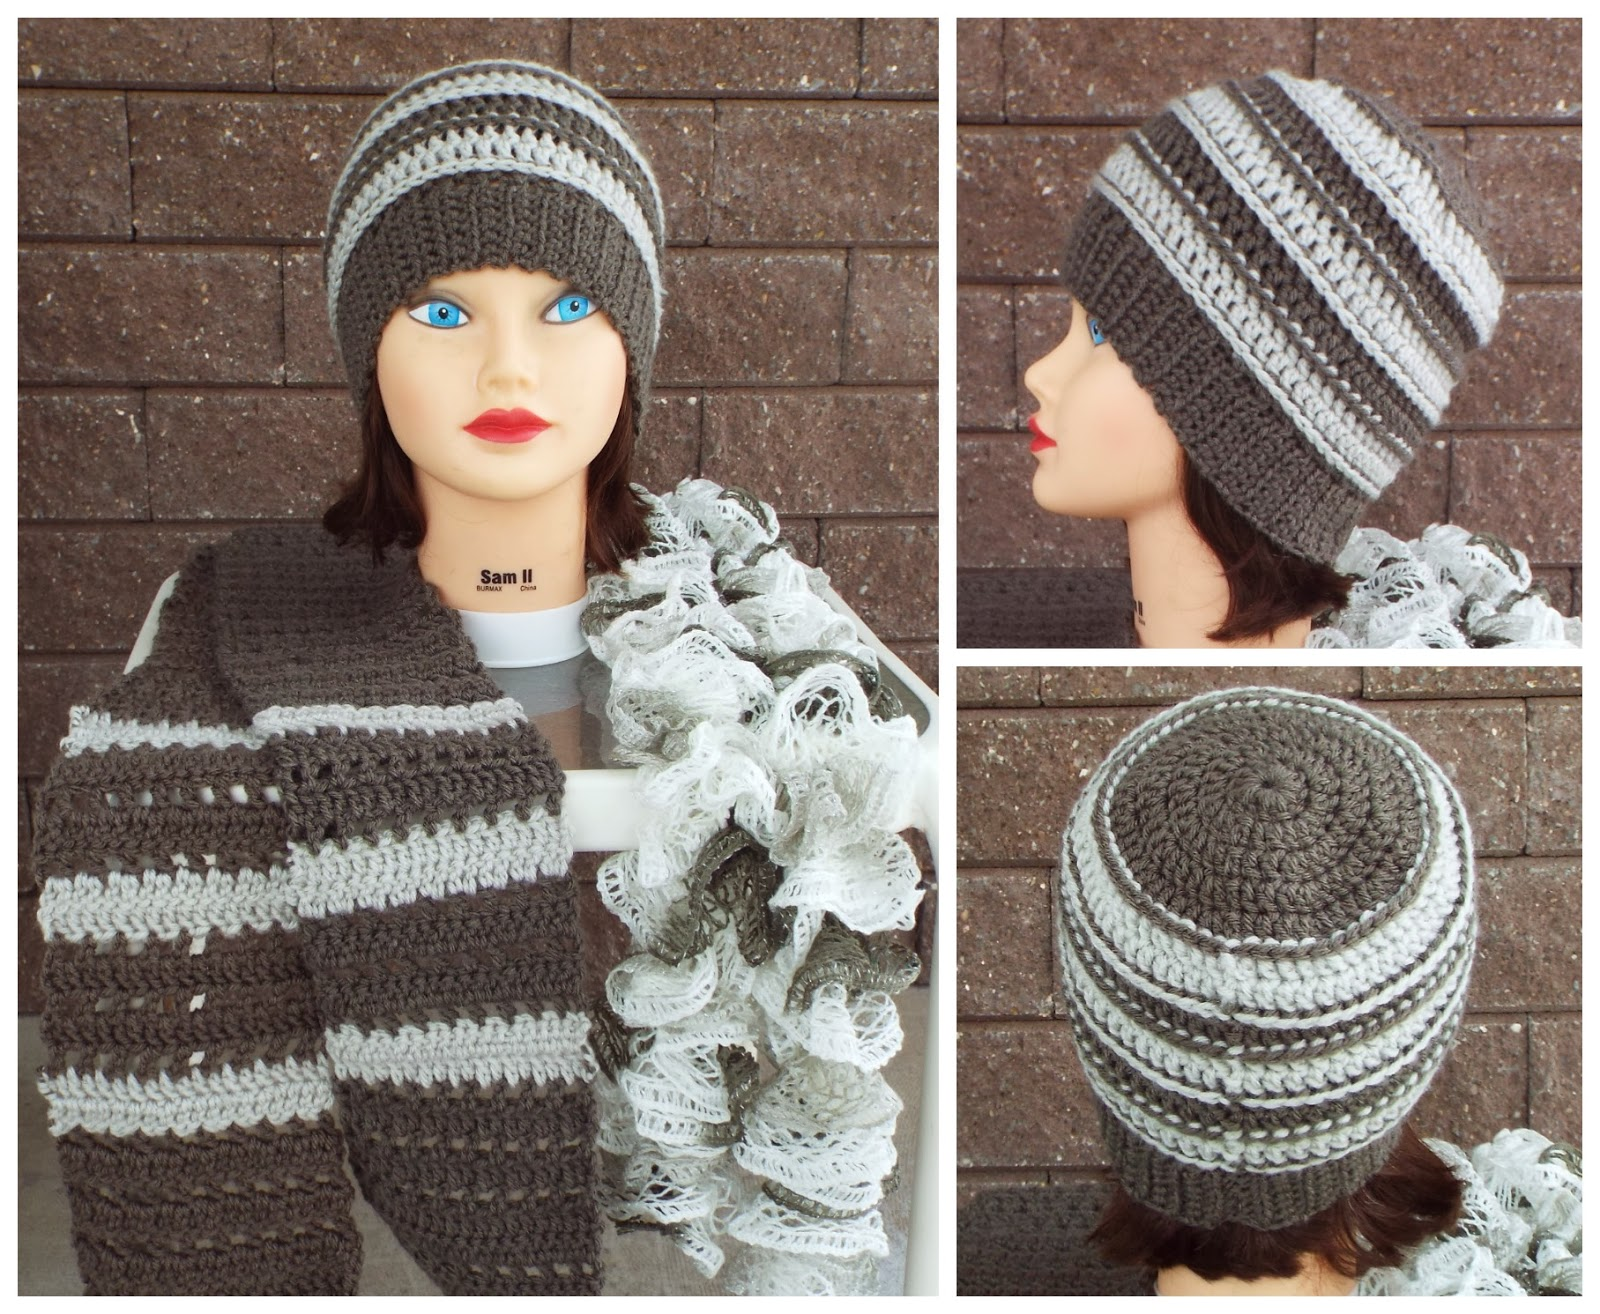 Crochet Scarf Patterns Using Q Hook : Hooks Happenings: Some crochet projects